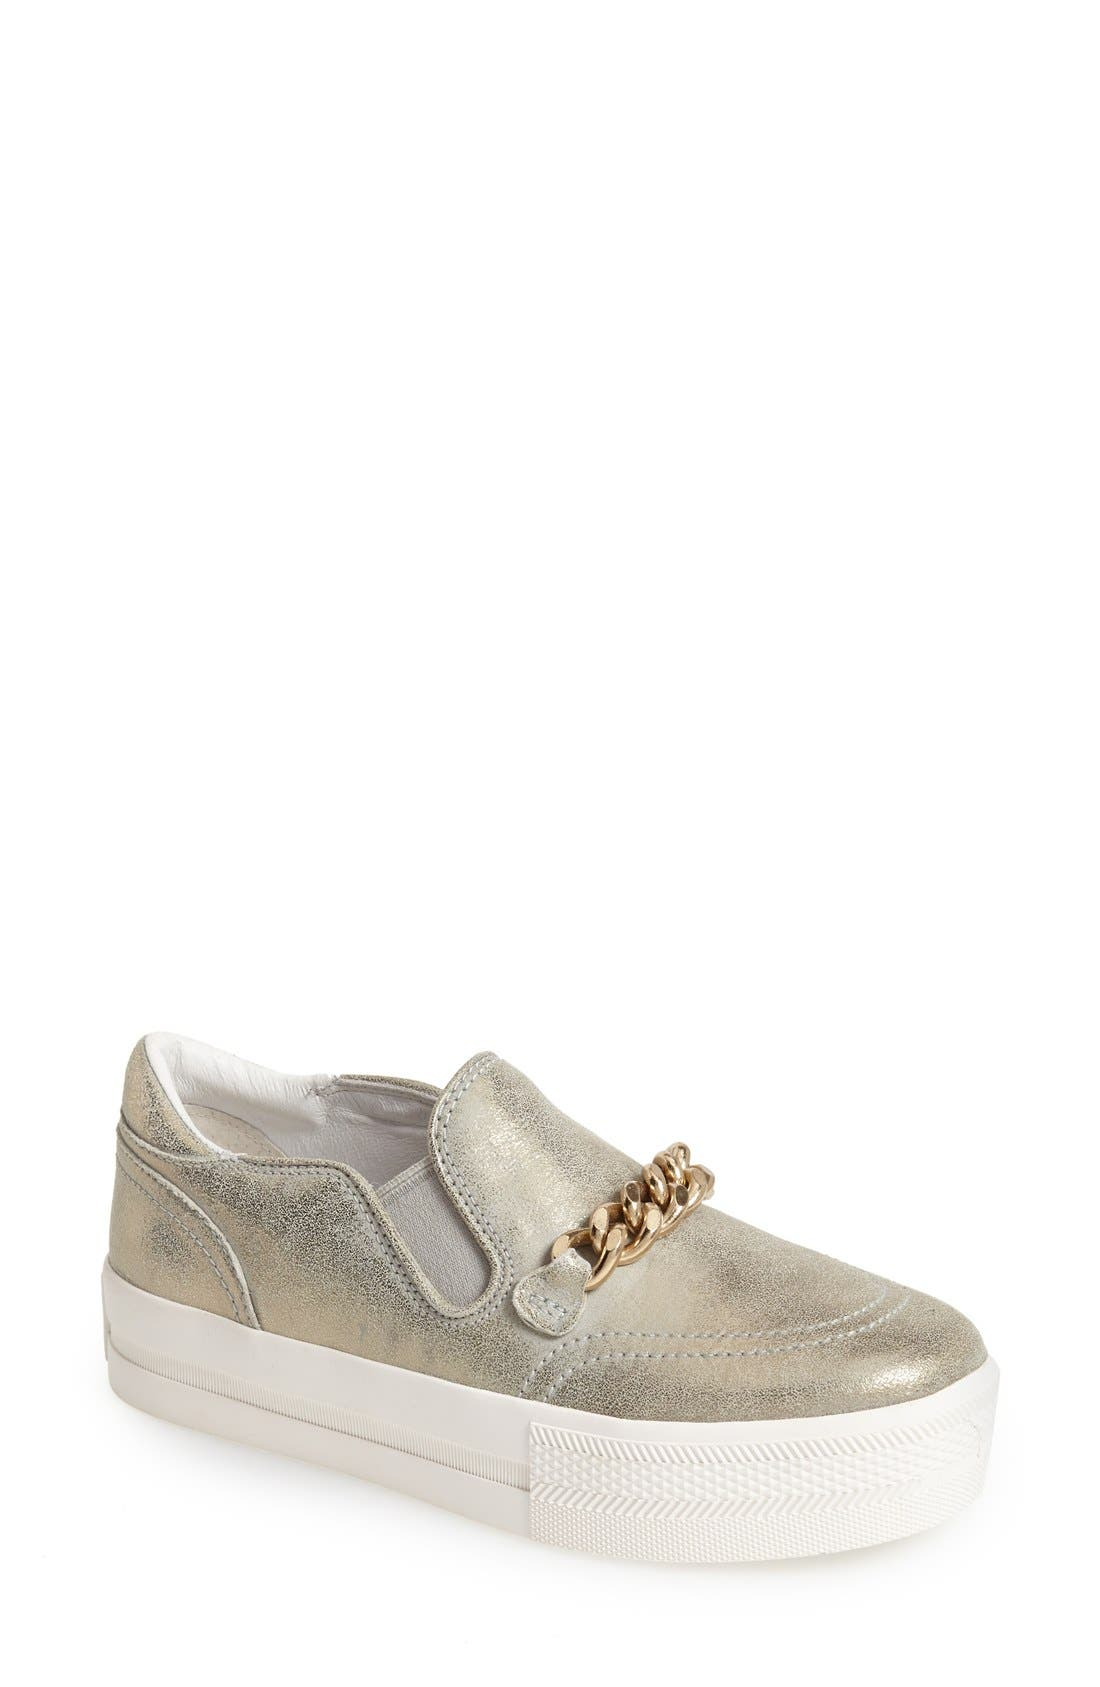 Main Image - Ash 'Joe' Platform Sneaker (Women)